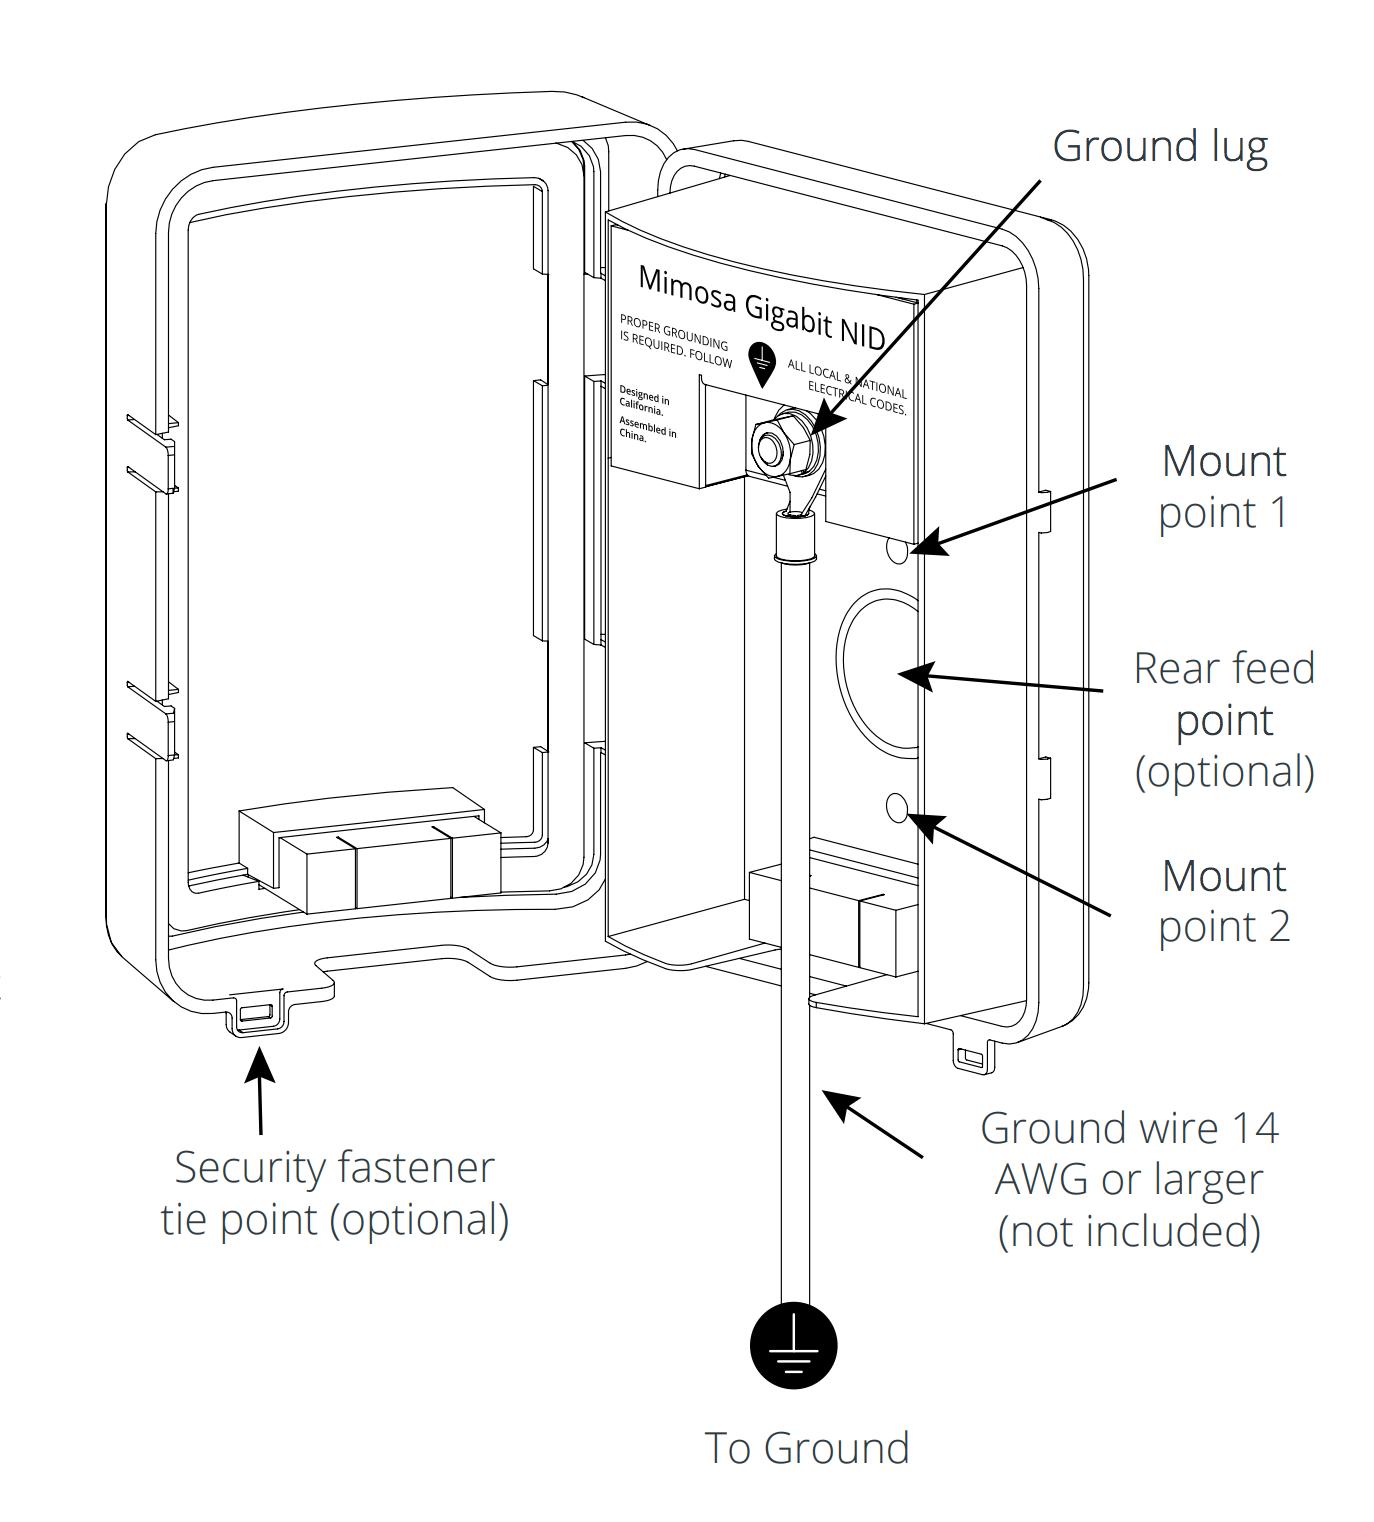 Gigabit Wiring A Plug Gigabit Circuit Diagrams